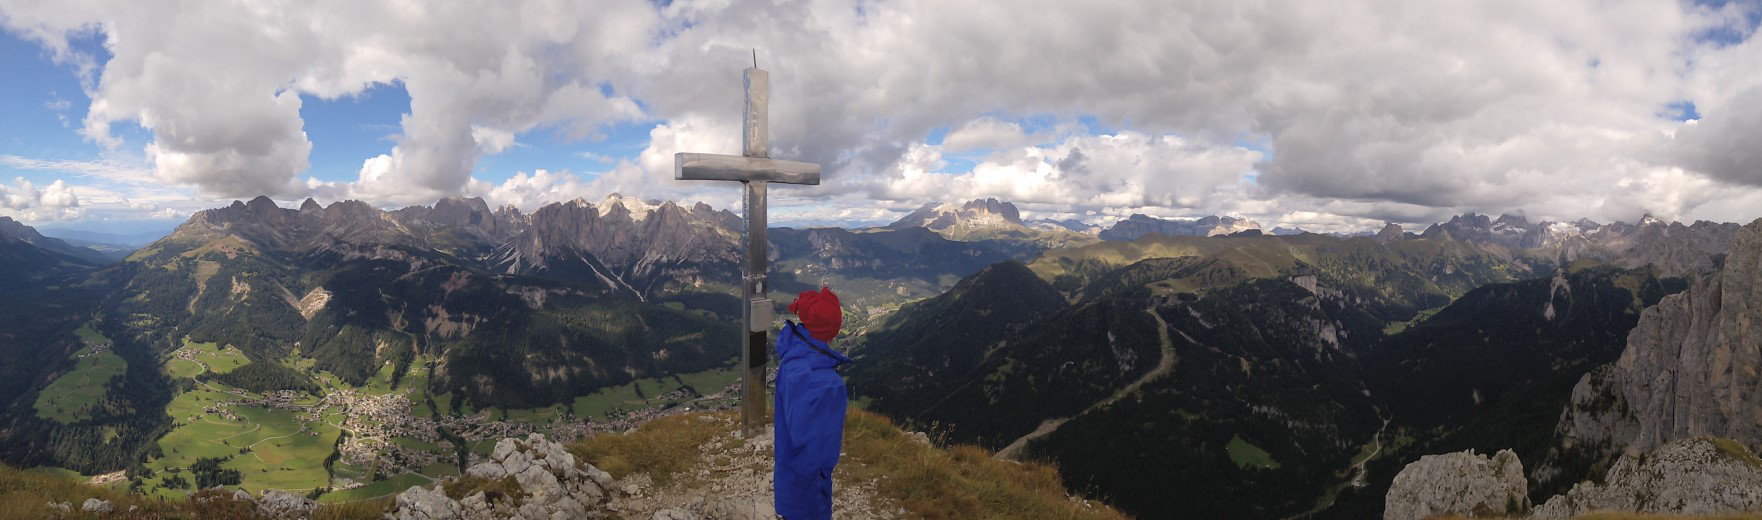 Vacanze Dolomiti